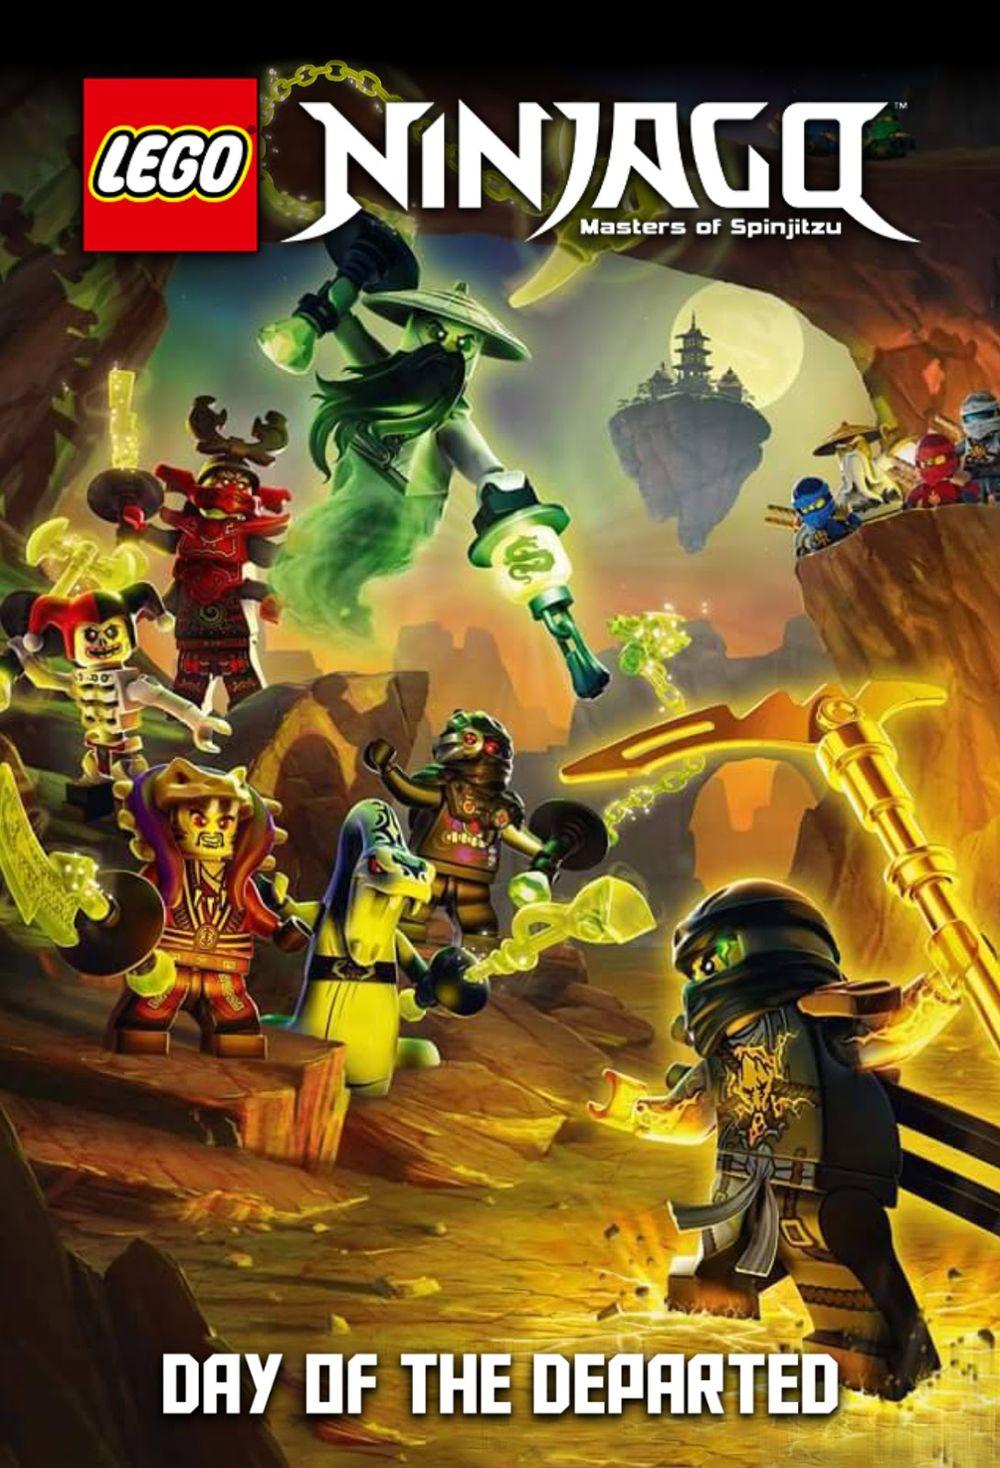 Ninjago: Masters of Spinjitzu - Day of the Departed (TV